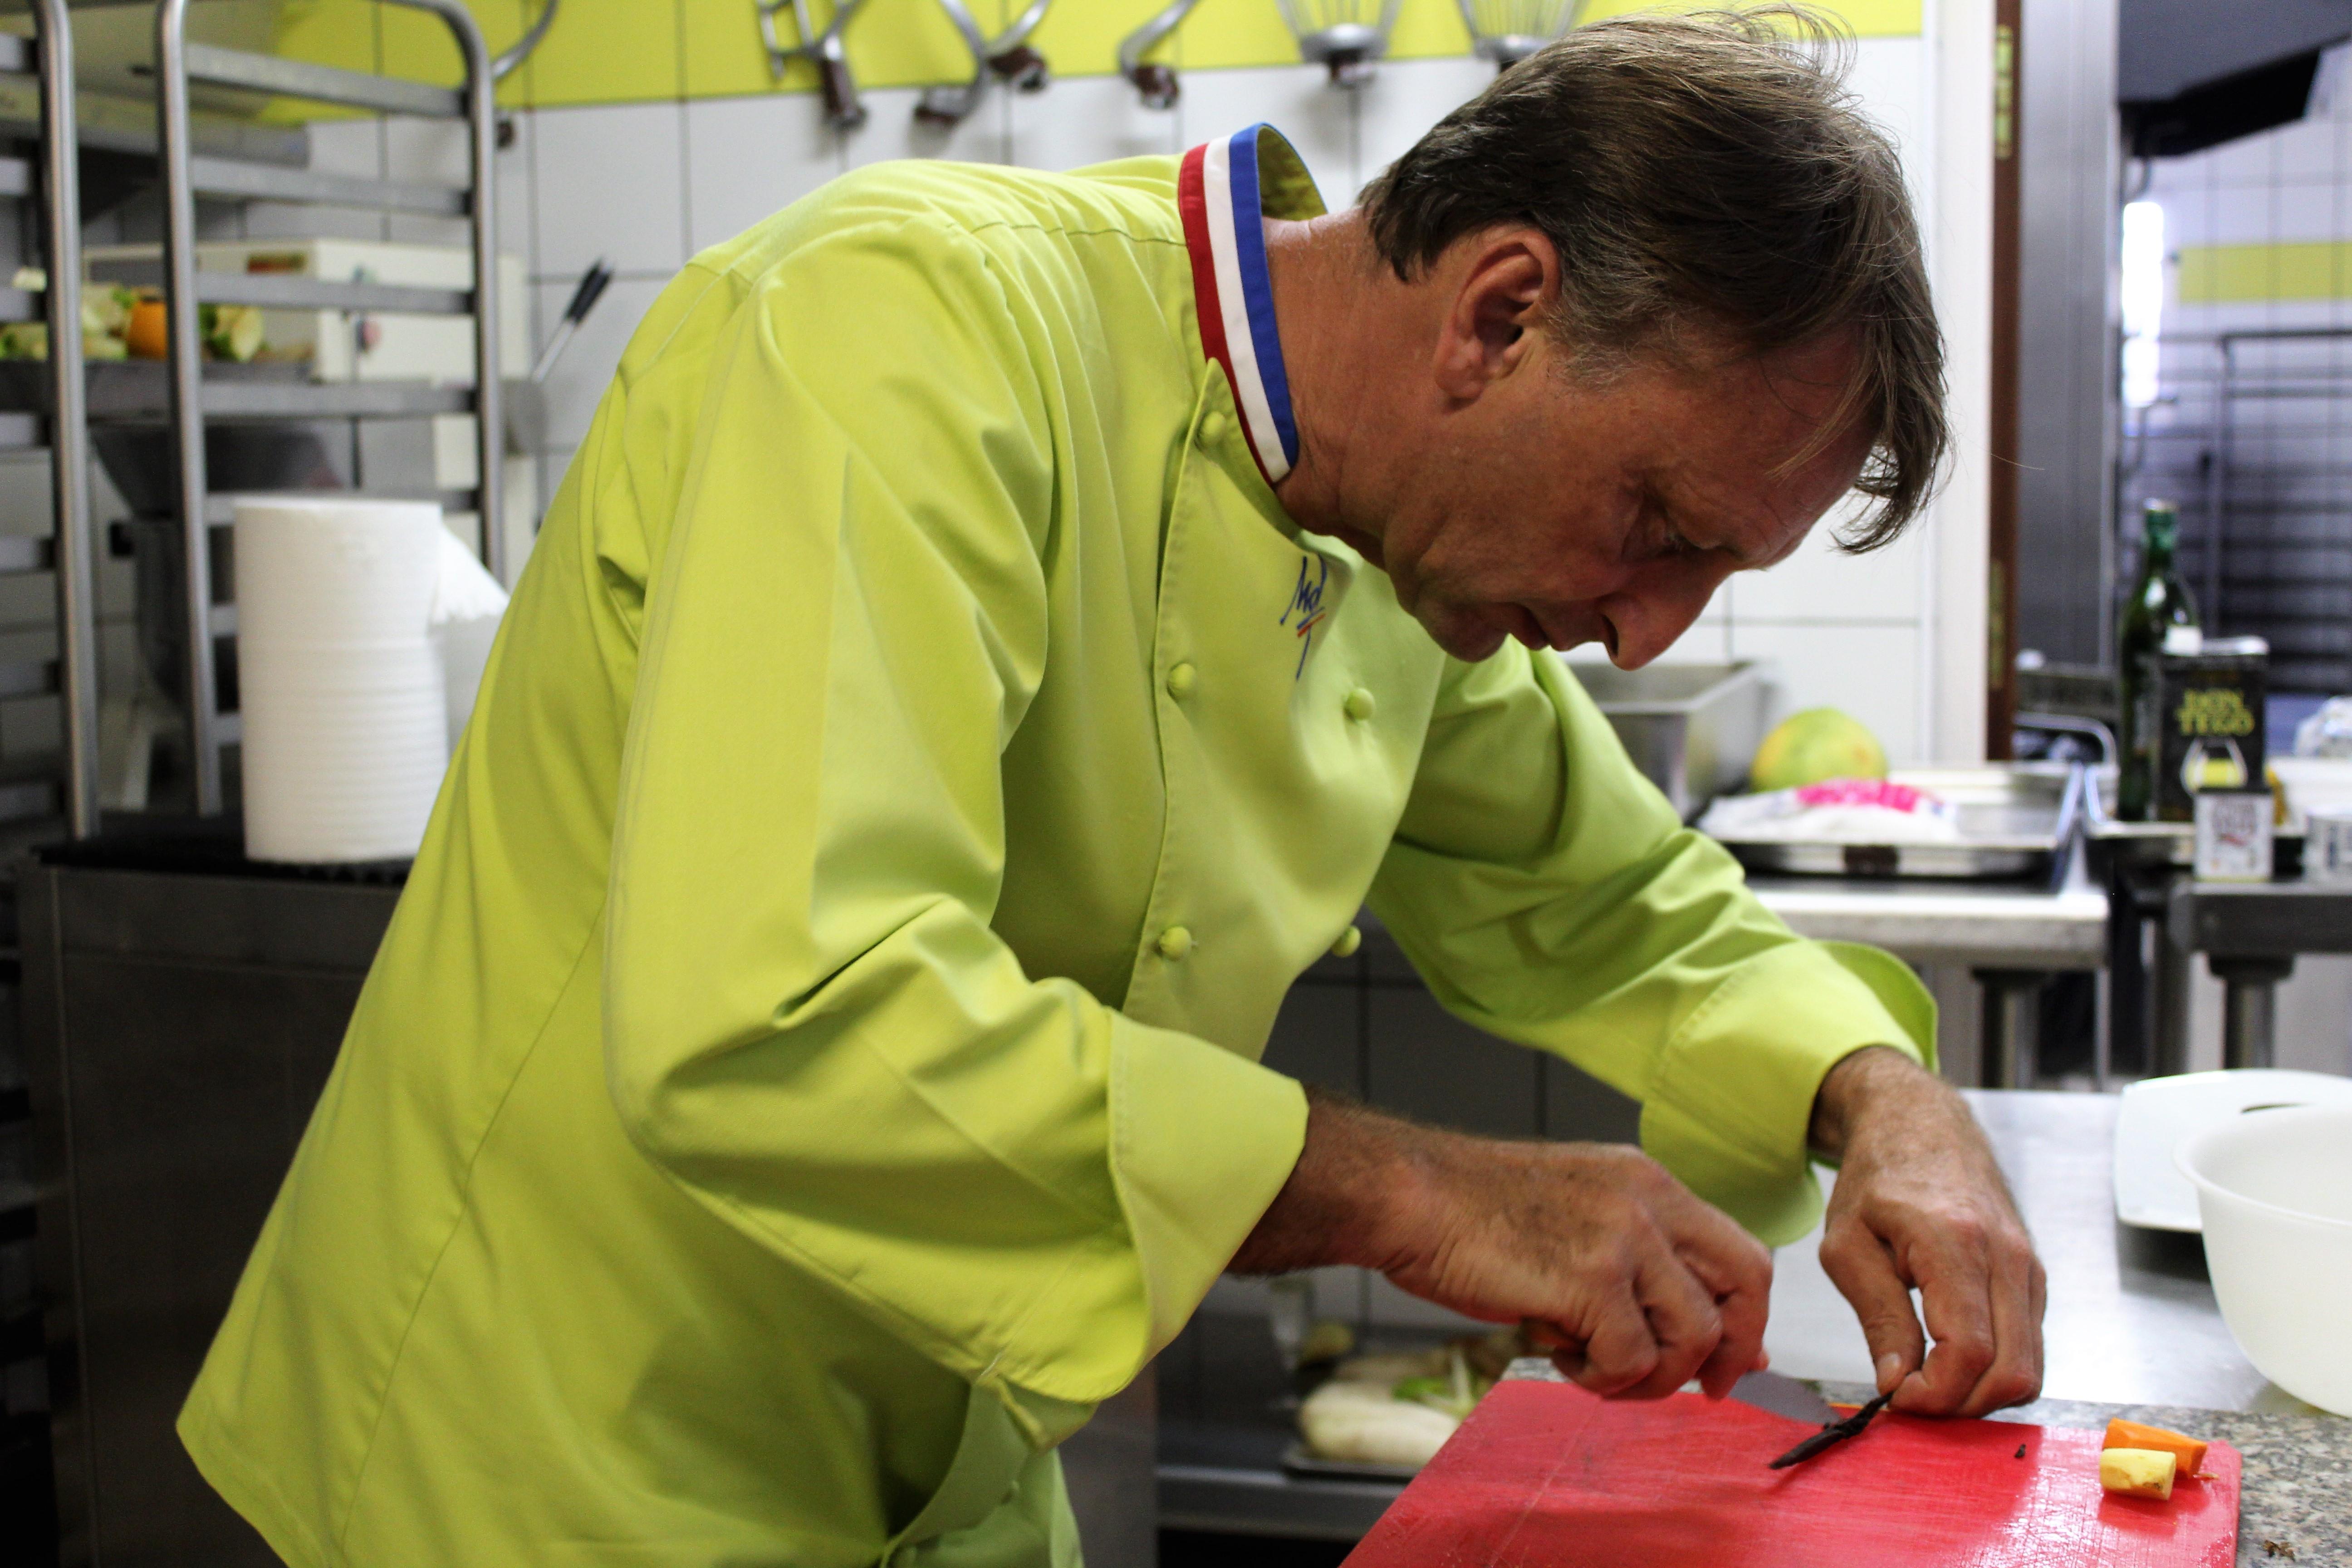 Des apprentis cuisiniers transformés en sculpteurs d'ananas